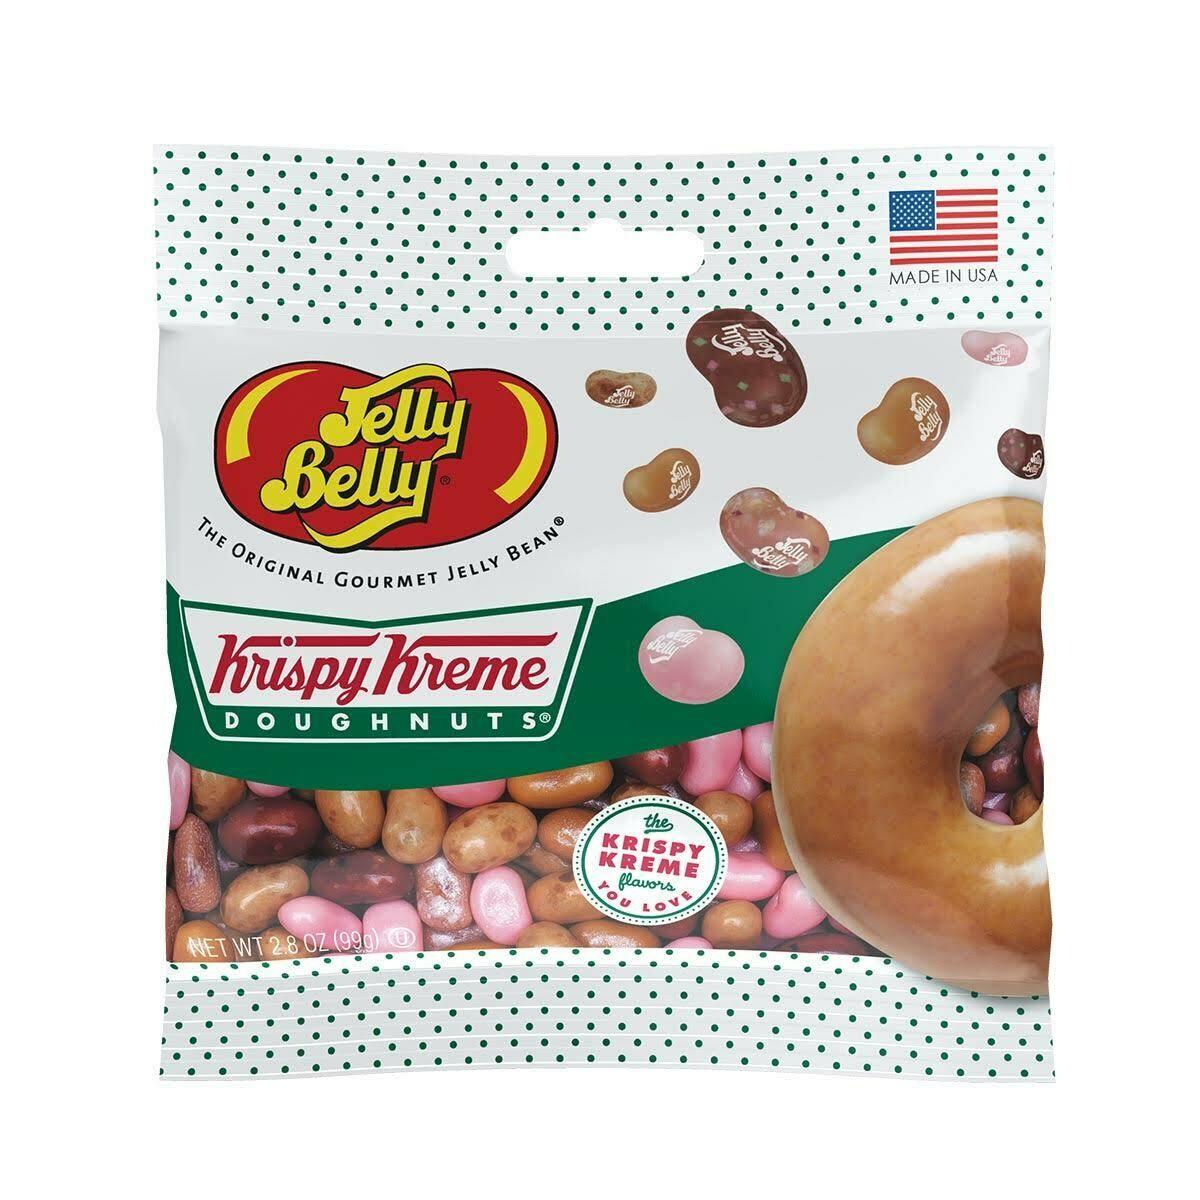 Krispy Cream Jelly Belly Bag